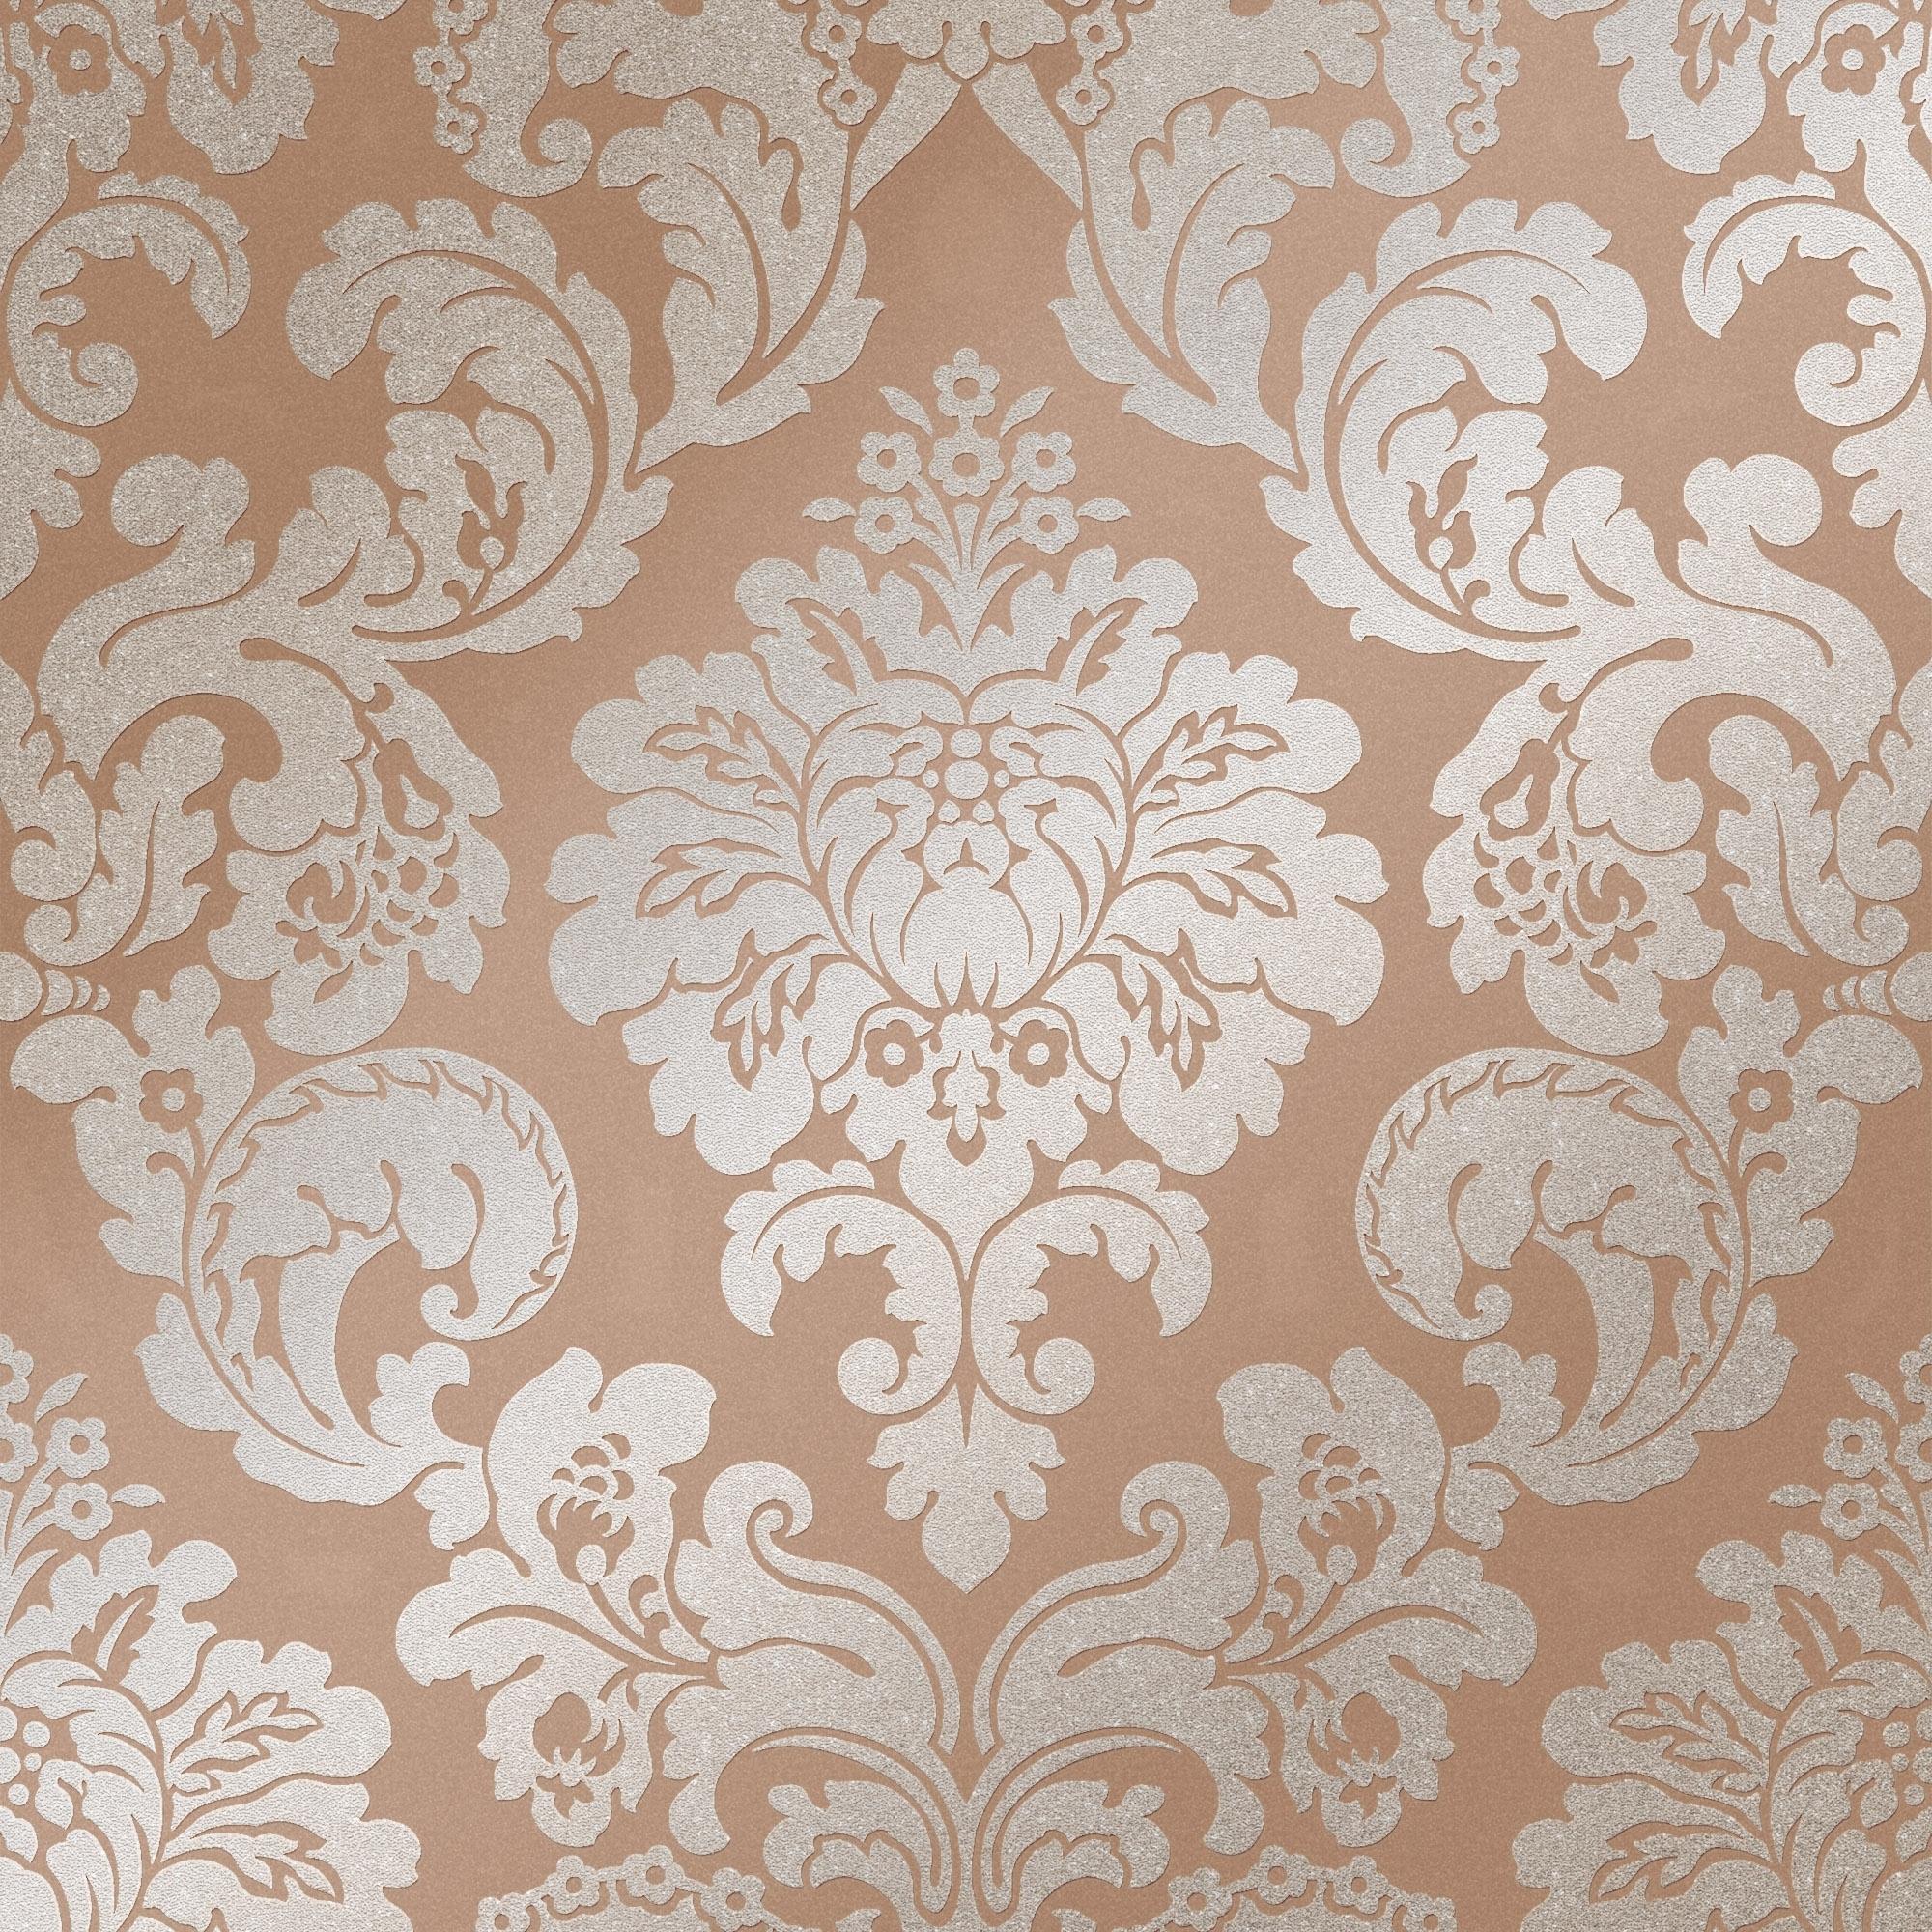 Henderson Interiors Kensington Textured Damask Speedyhang